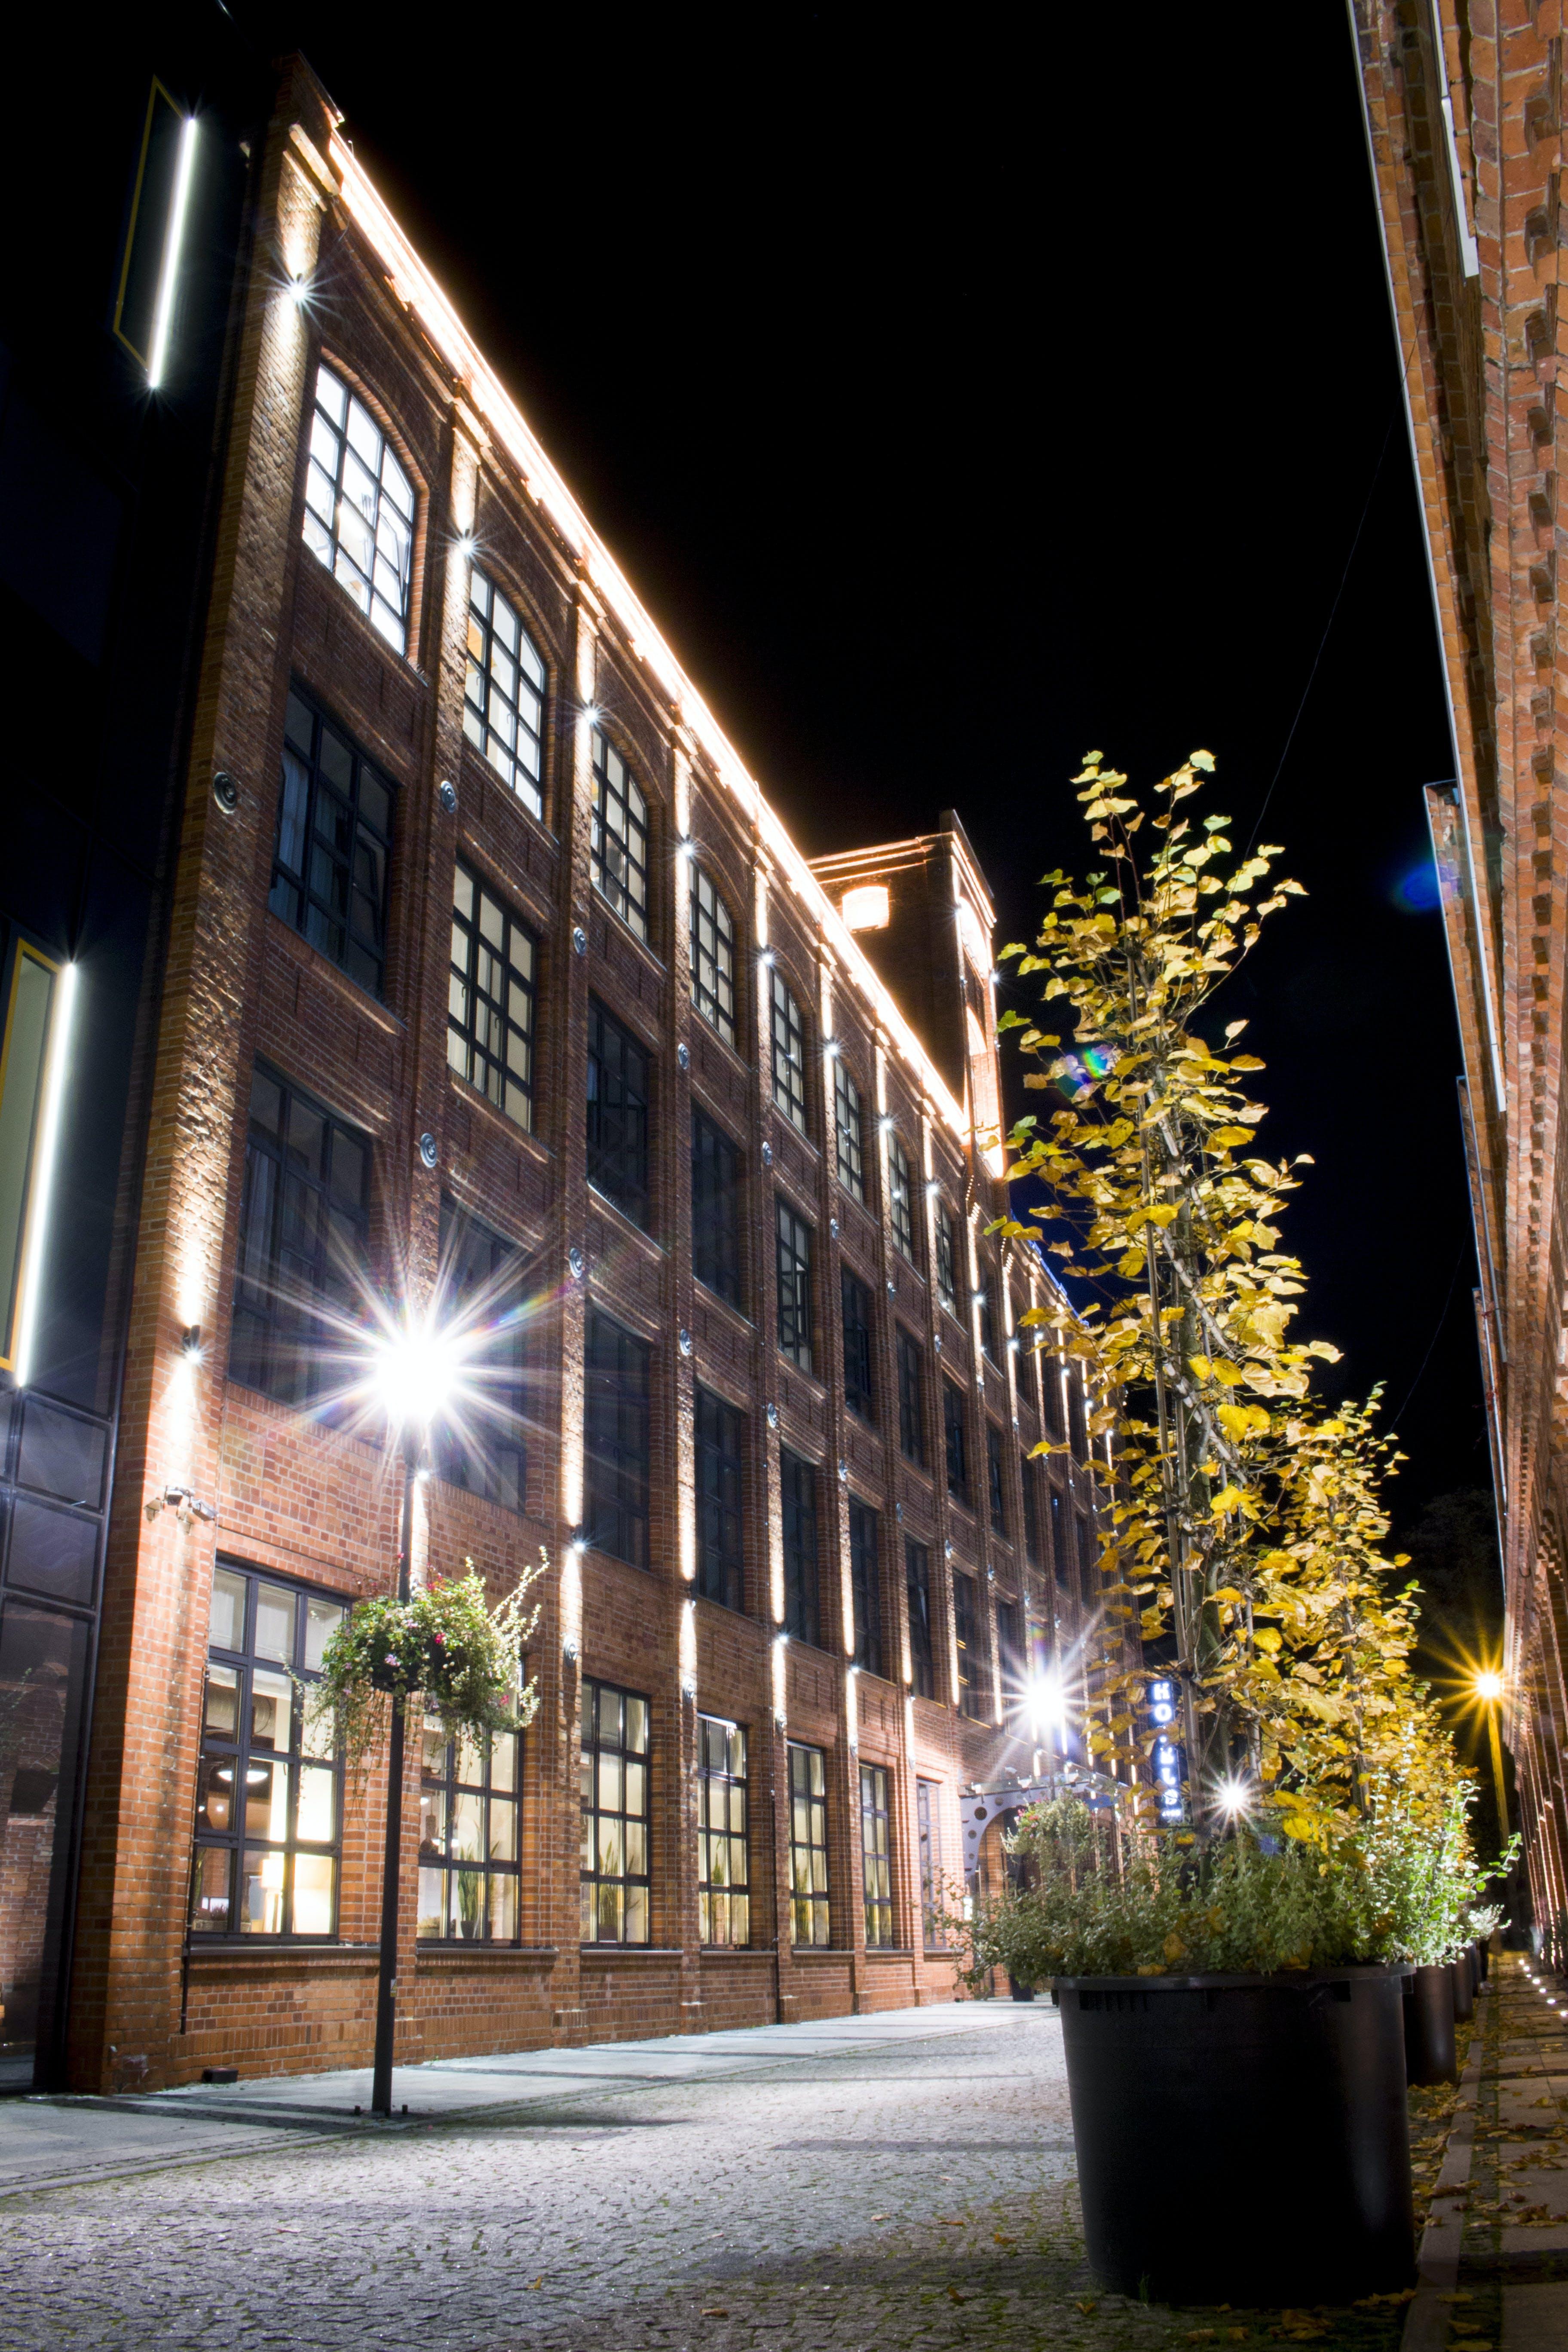 Free stock photo of city, flowers, hotel, bricks